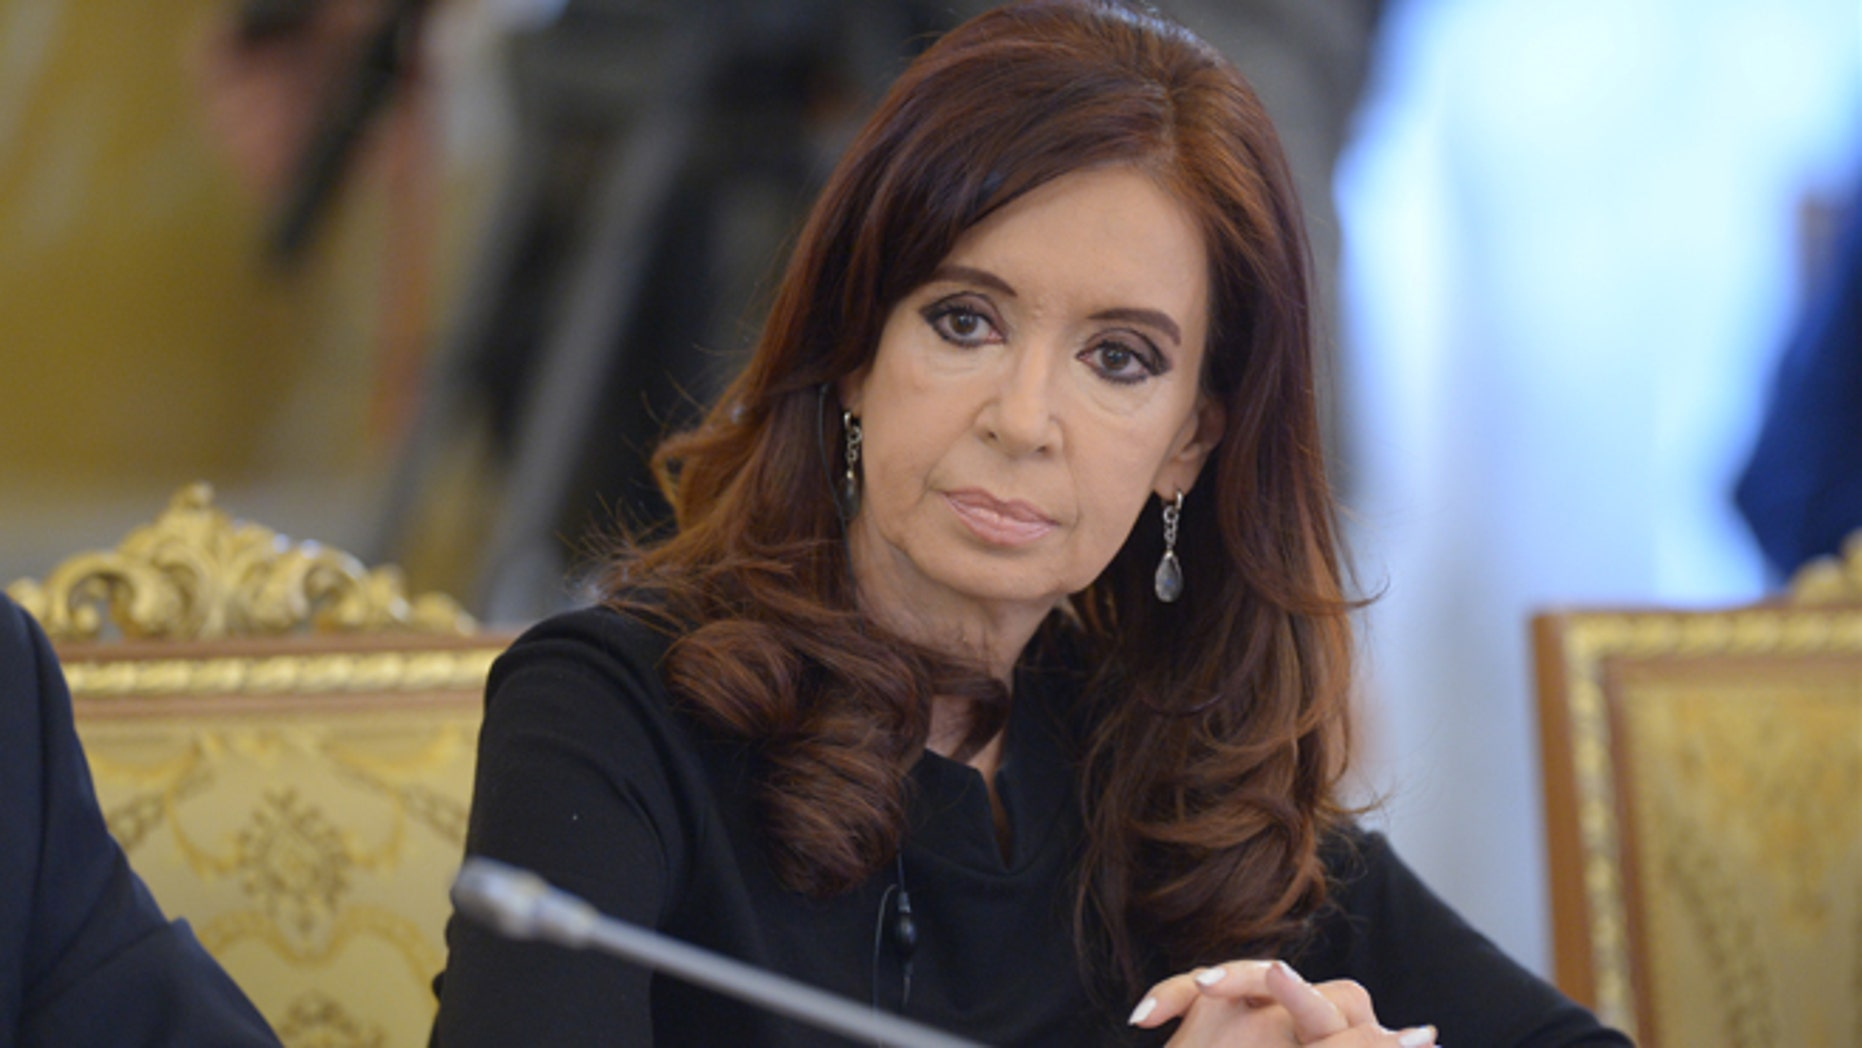 Argentinean President Cristina Fernández de Kirchner. (Photo by Grigoriy Sisoev/Host Photo Agency via Getty Images)